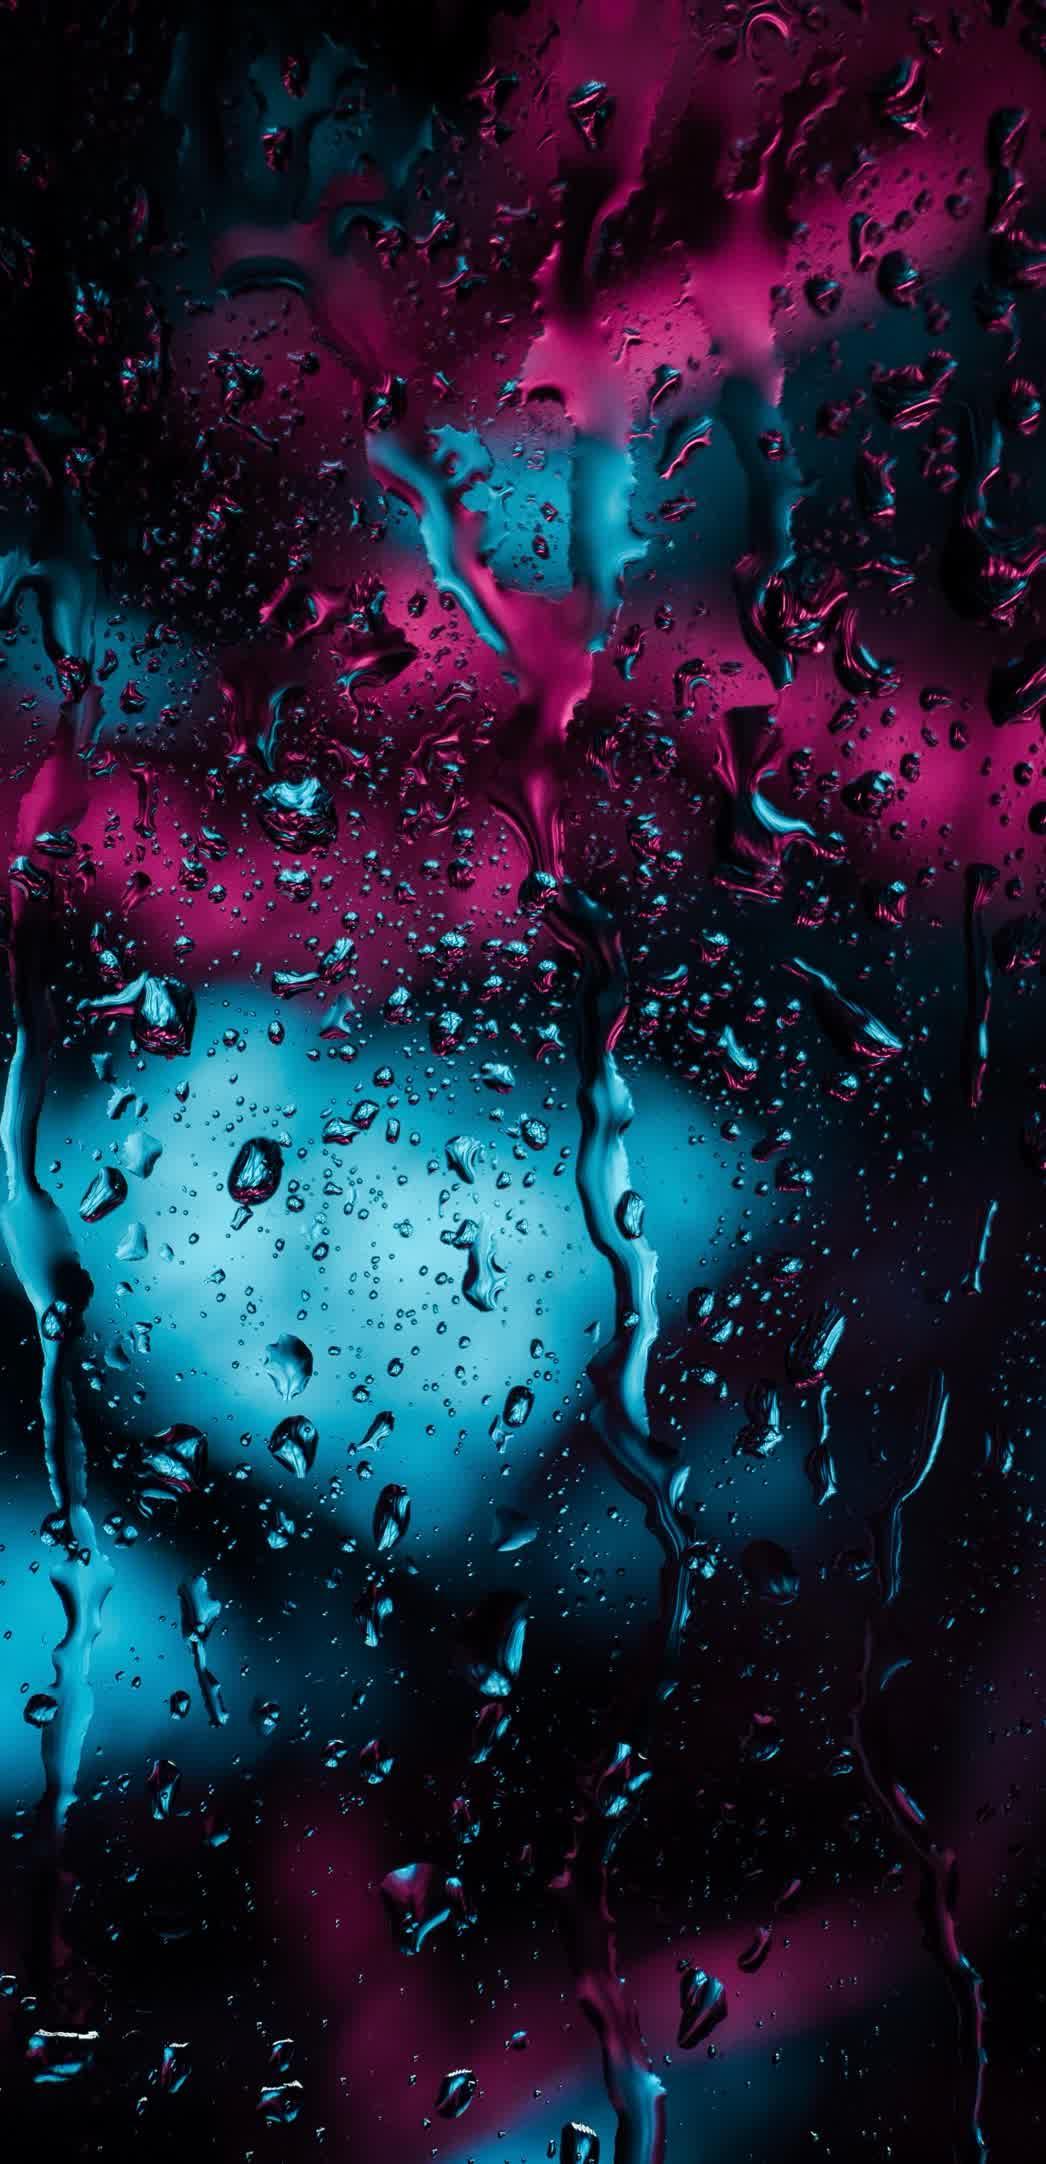 Iphone 12 Pro Max Wallpaper Nawpic